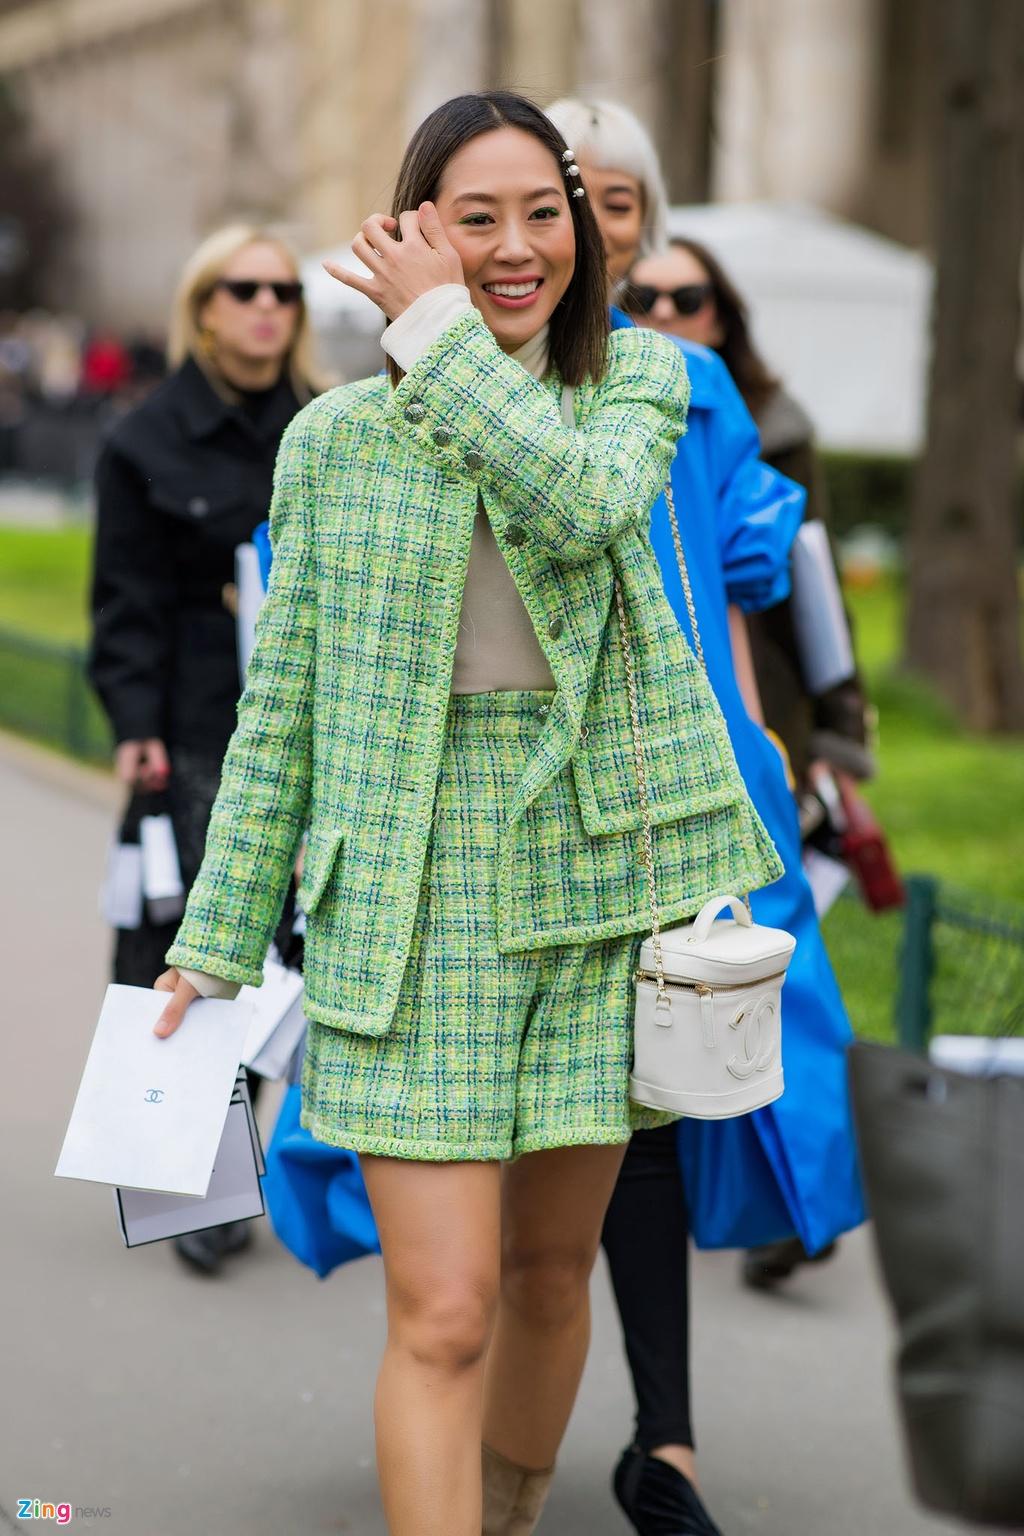 Khong khi nhon nhip truoc them show Chanel cuoi cua Karl Lagerfeld hinh anh 16